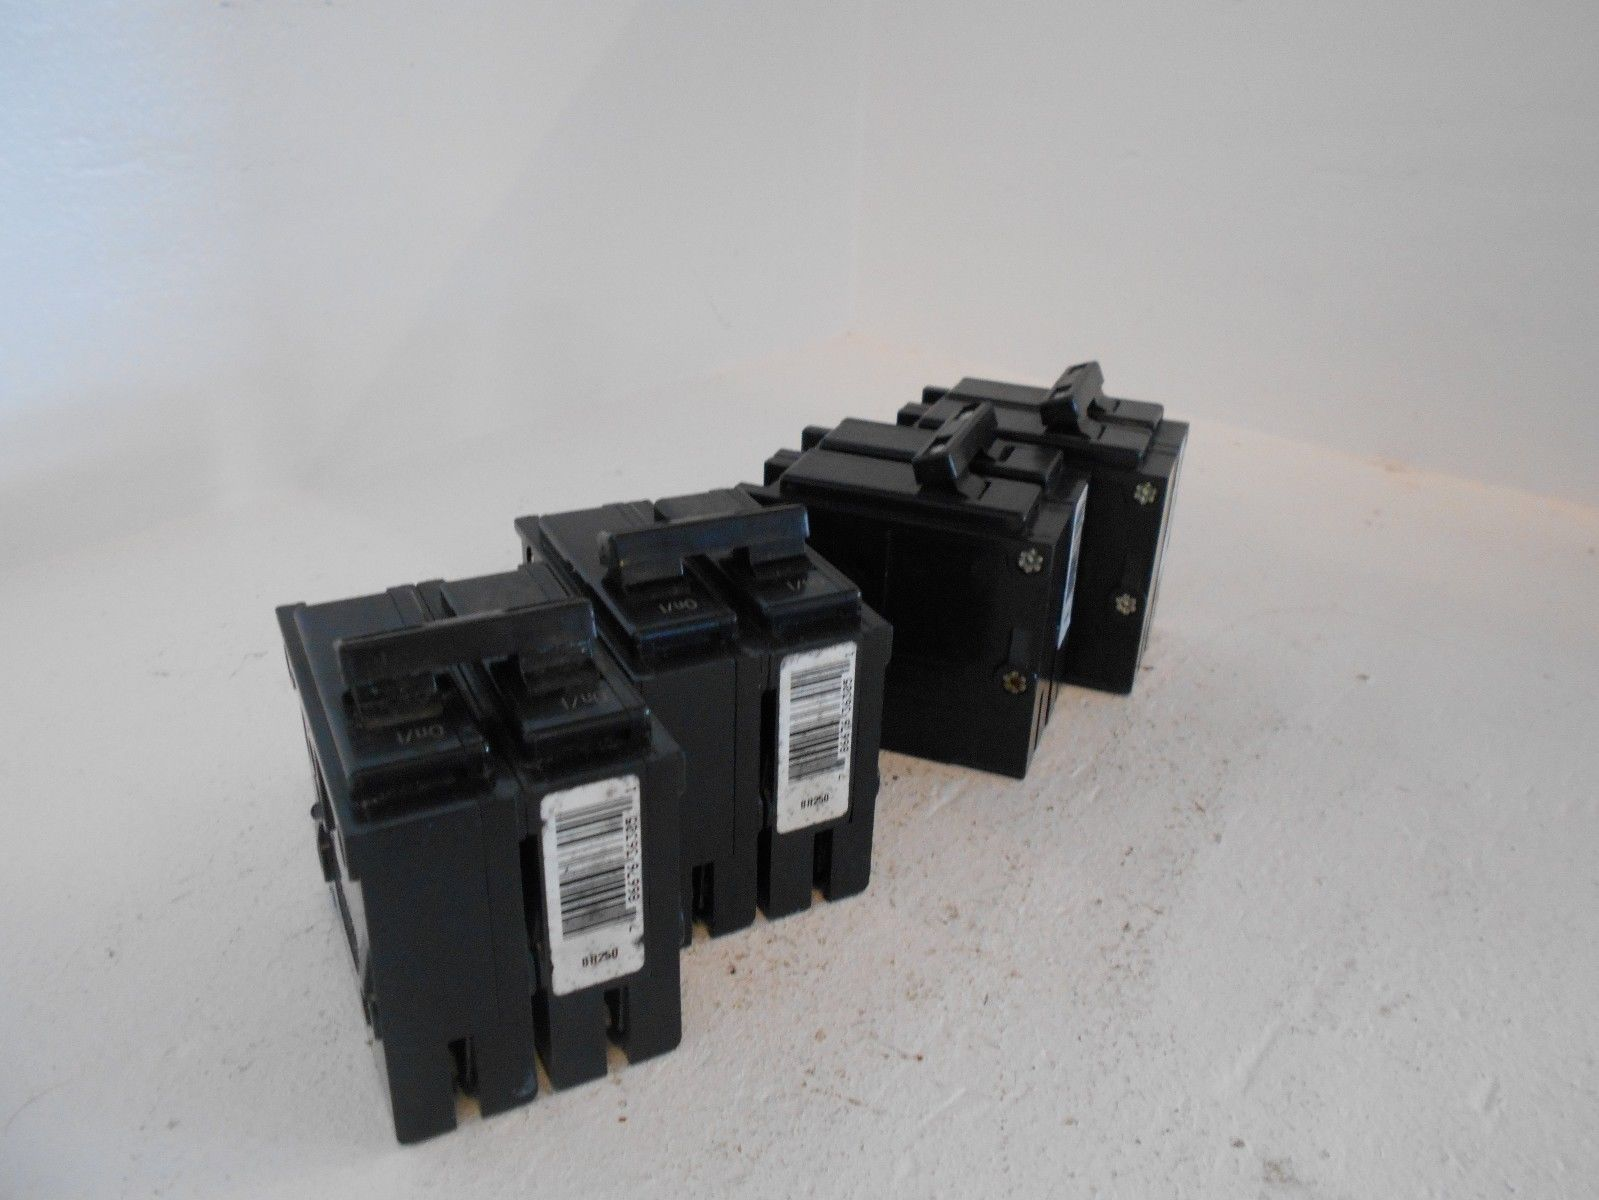 Powerbox Dpc 7500 240v 30 Amp Plug Play 3 Prong